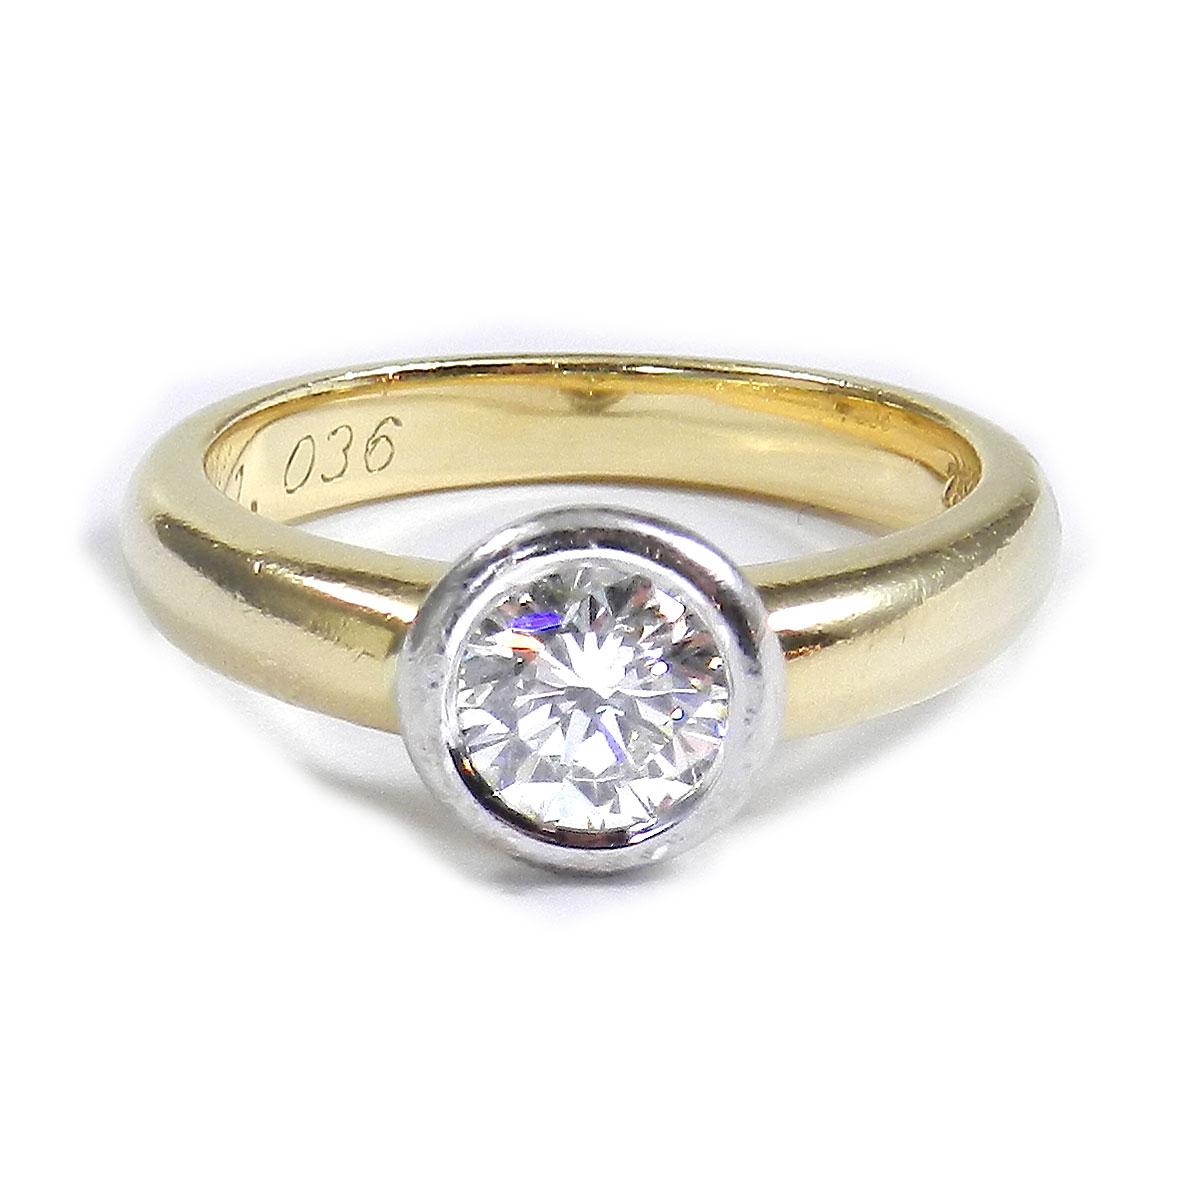 1 ct diamant solit r ring mit lupenreinem brillanten in 750 gold diamond ebay. Black Bedroom Furniture Sets. Home Design Ideas